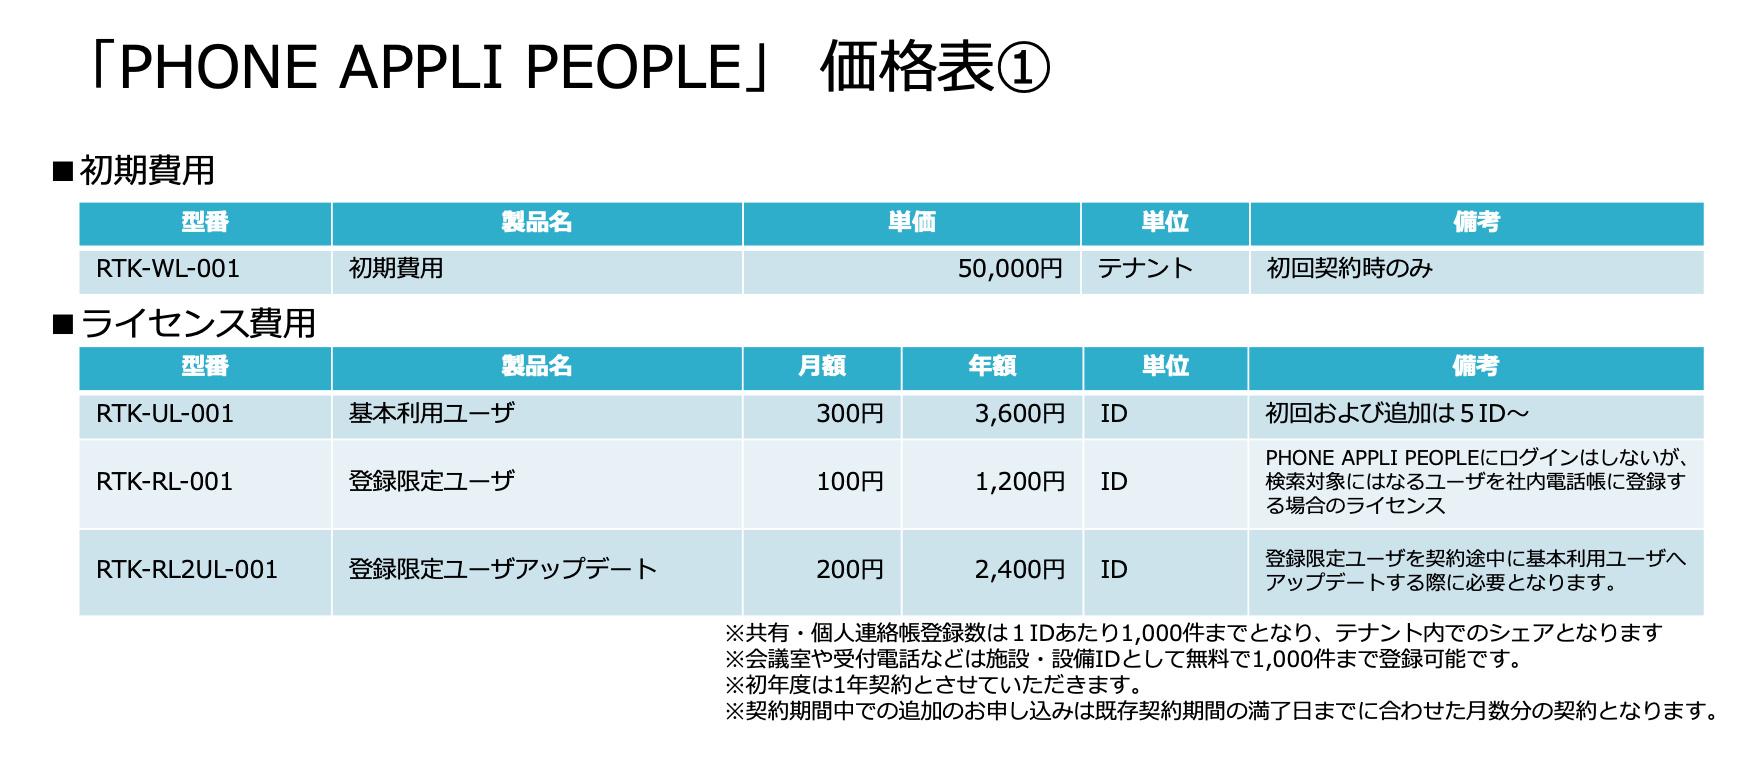 PHONE APPLI PEOPLE価格表